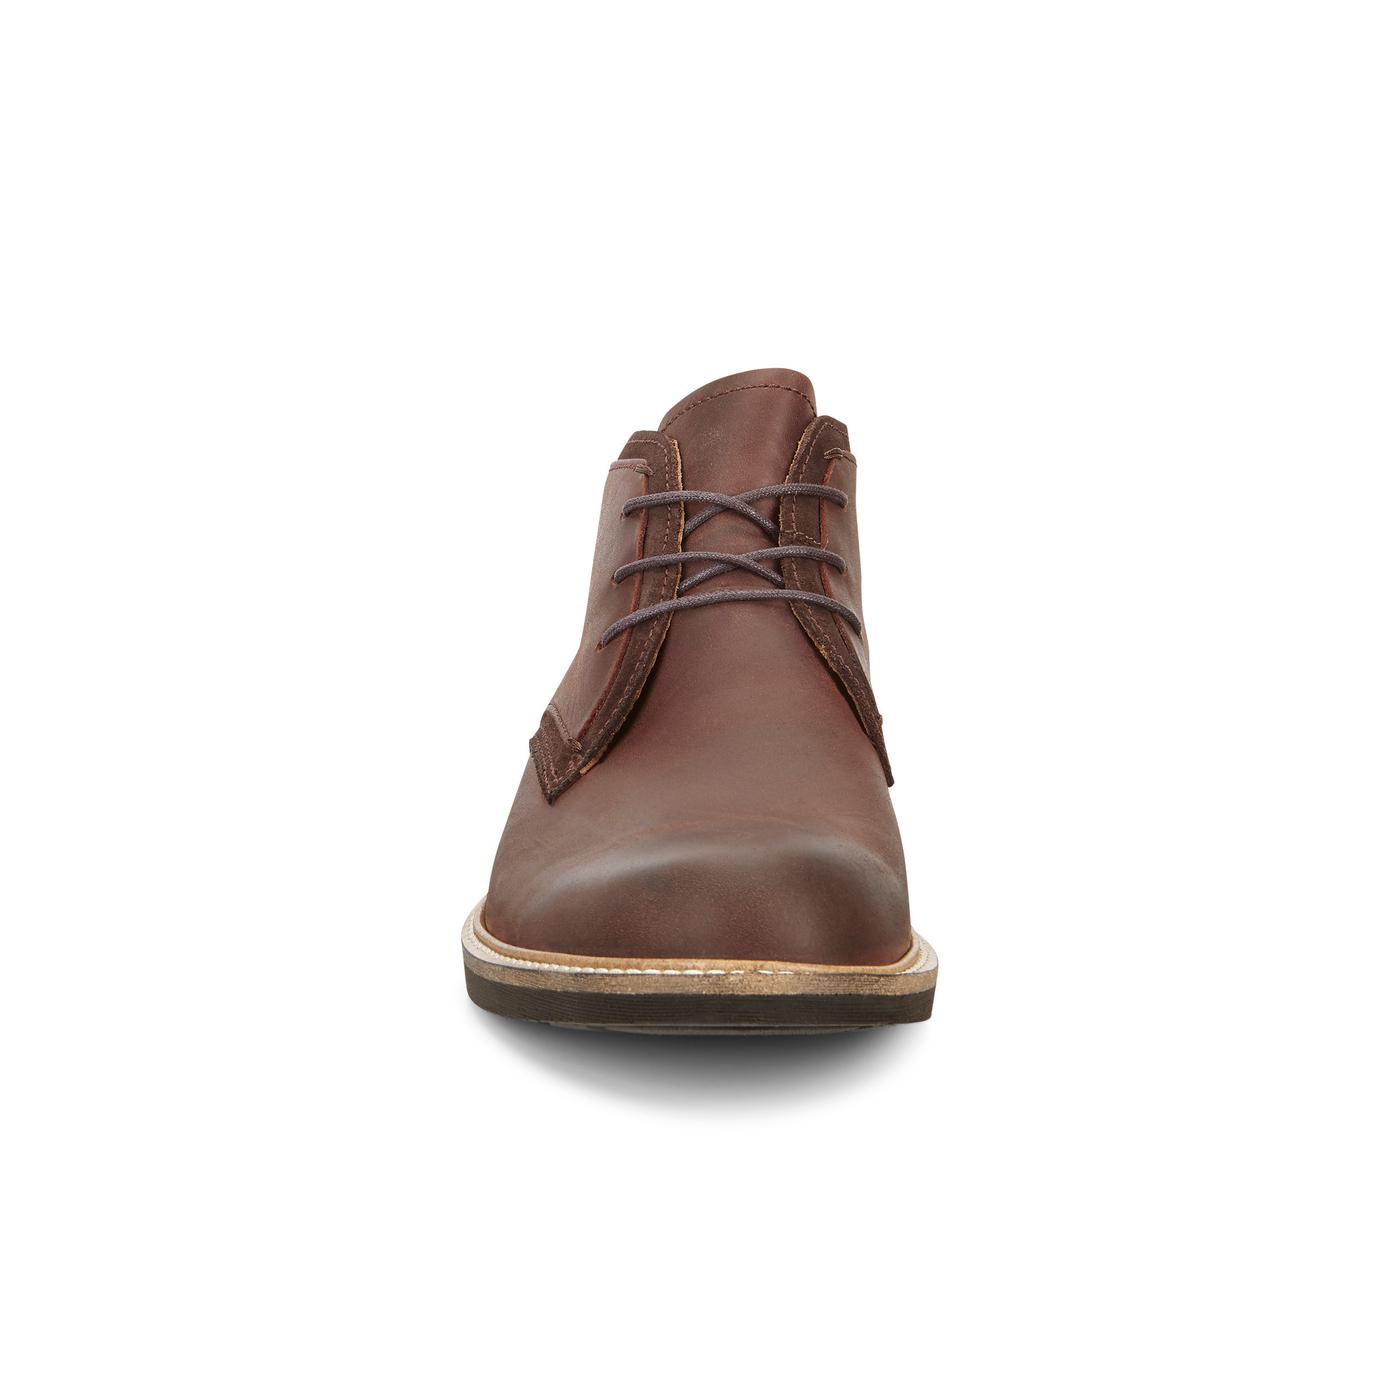 8191600a56 ECCO Men's Kenton Derby Boot | ECCO® Shoes